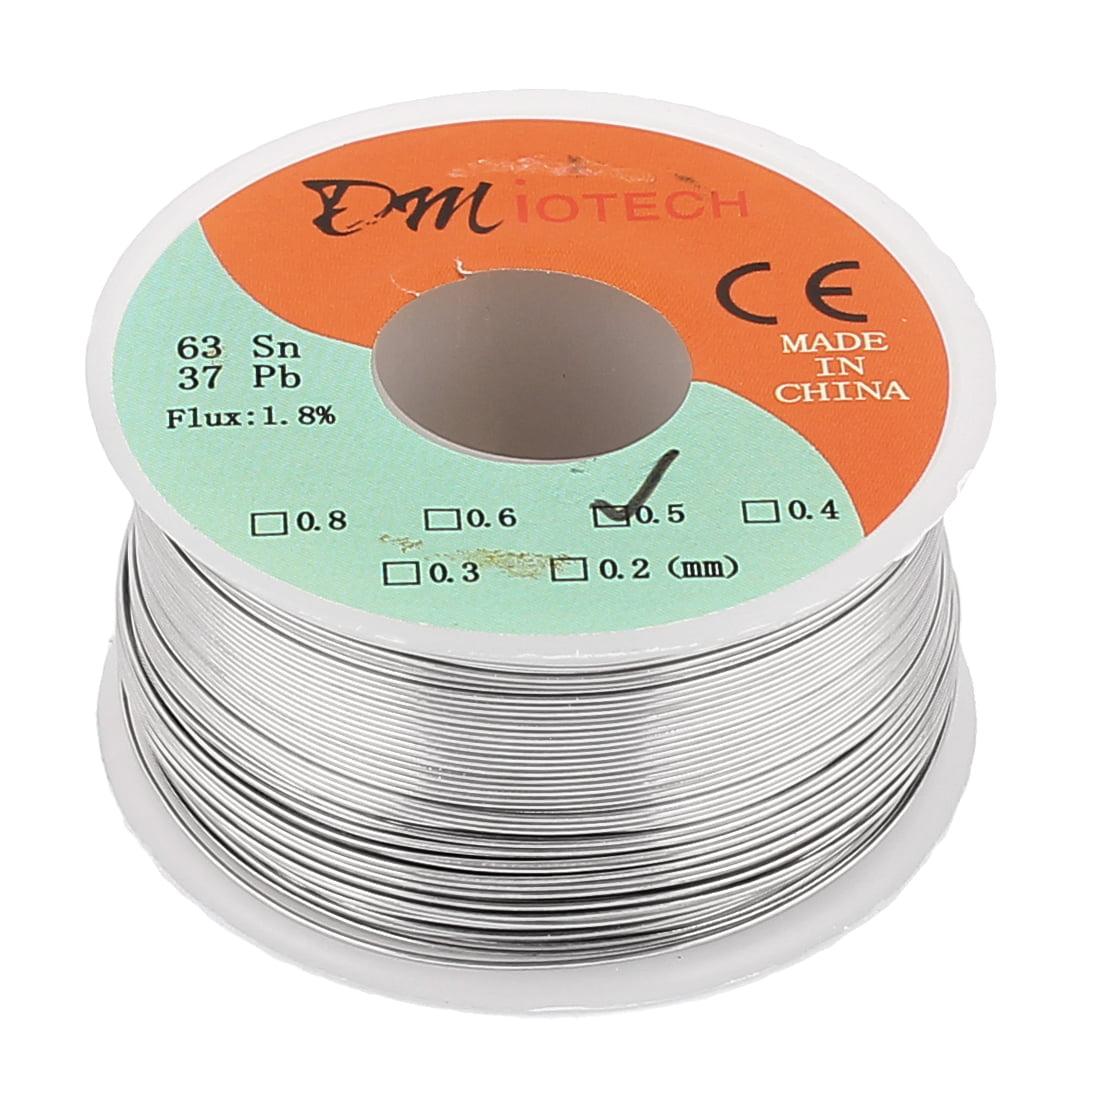 DMiotech 0.5mm 150G 63/37 Rosin Core Flux 1.8% Tin  Roll Solder Wire